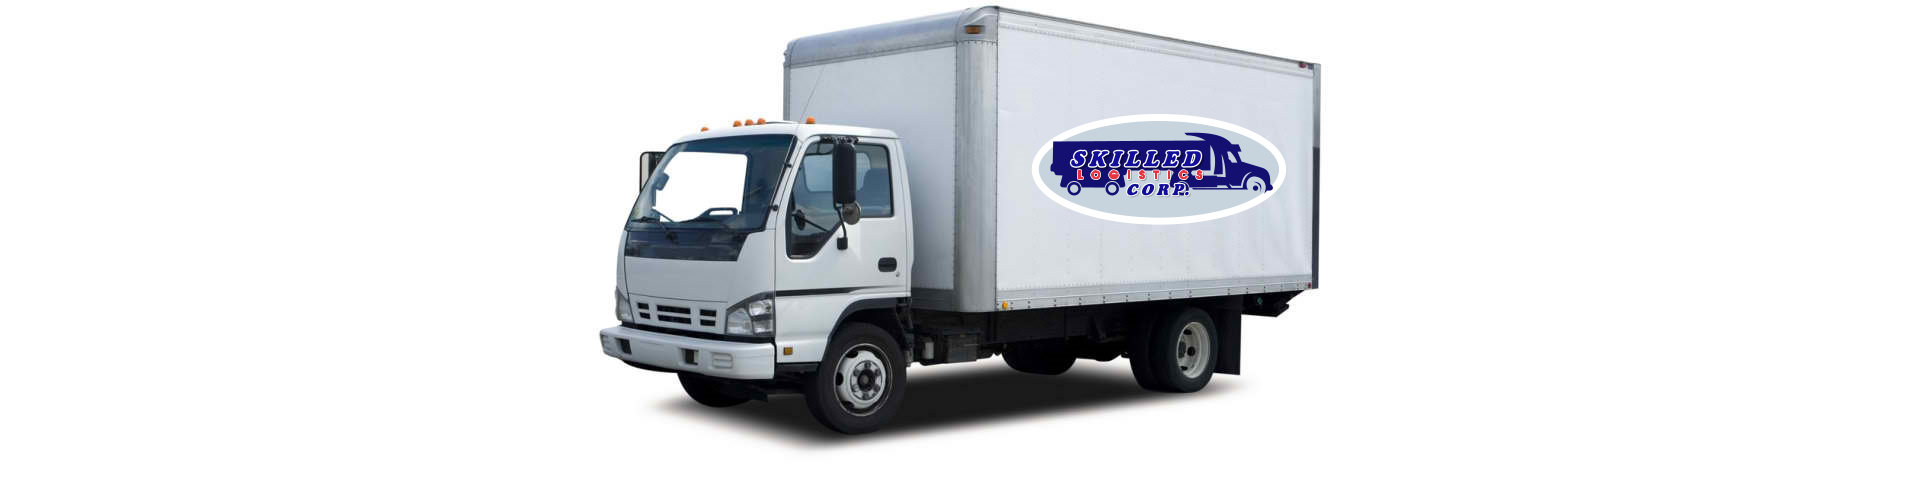 white small truck